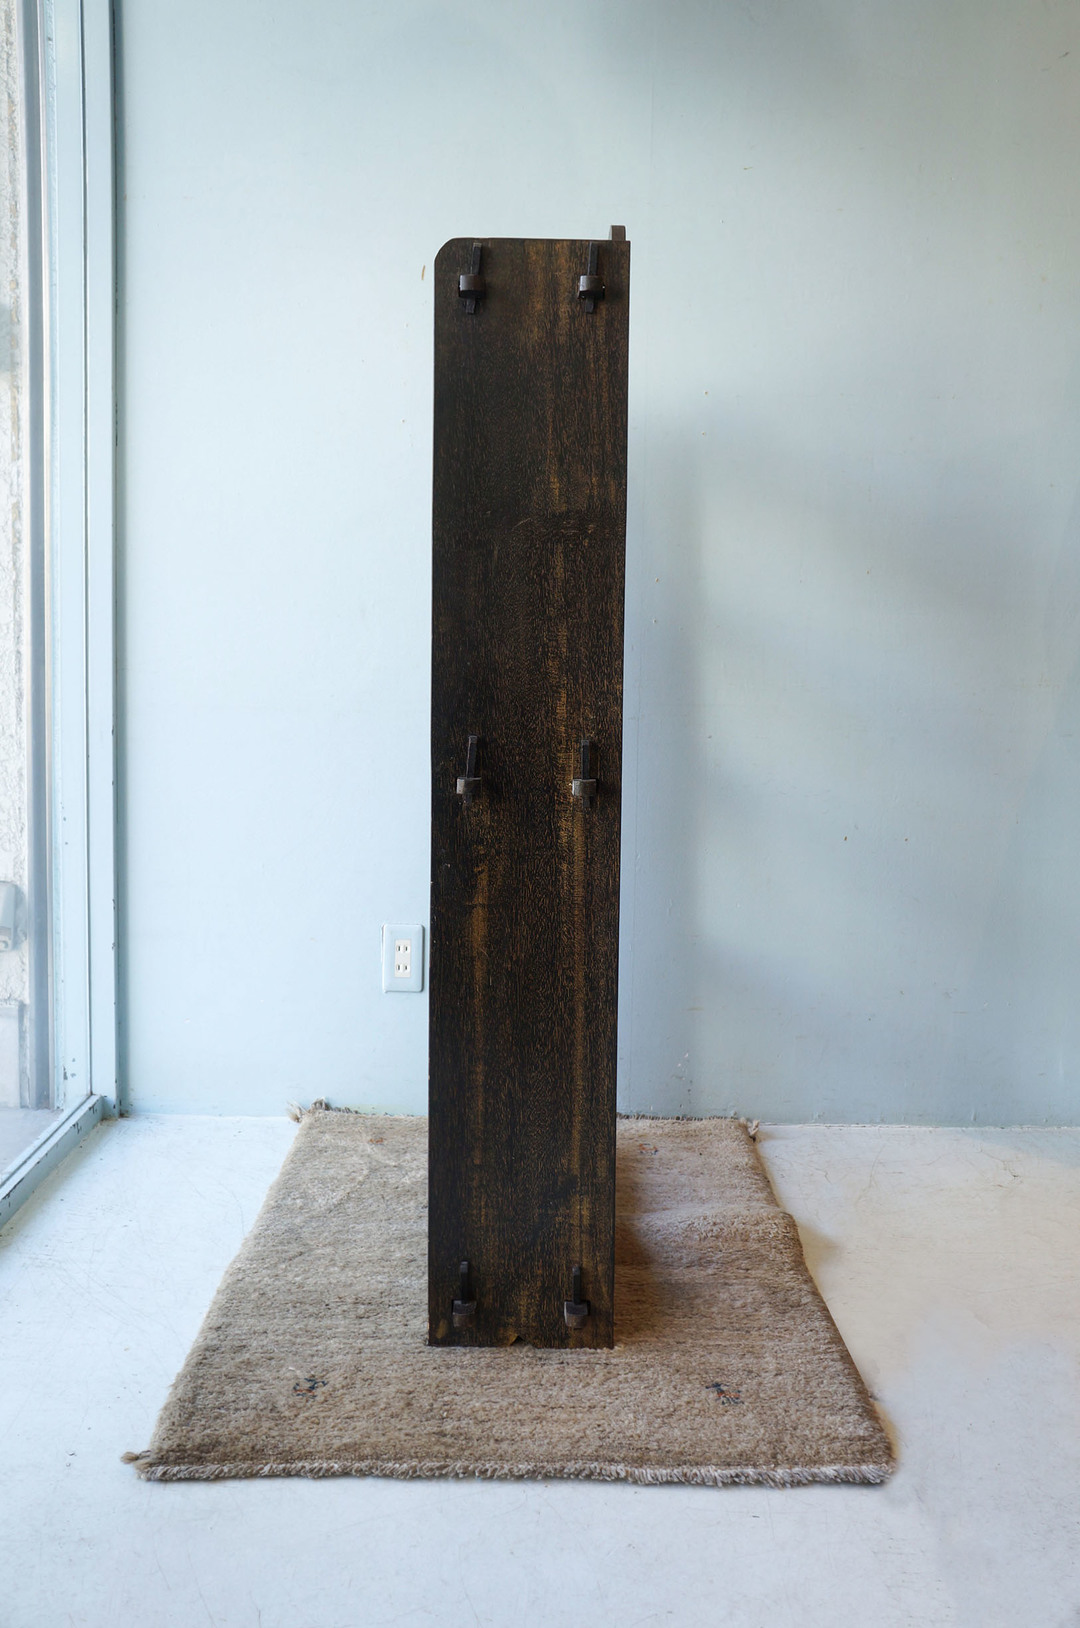 Japanese Vintage Wedge Book Shelf/ジャパンヴィンテージ 本棚 ブックシェルフ 楔式 収納 古道具 昭和レトロ 黒 2